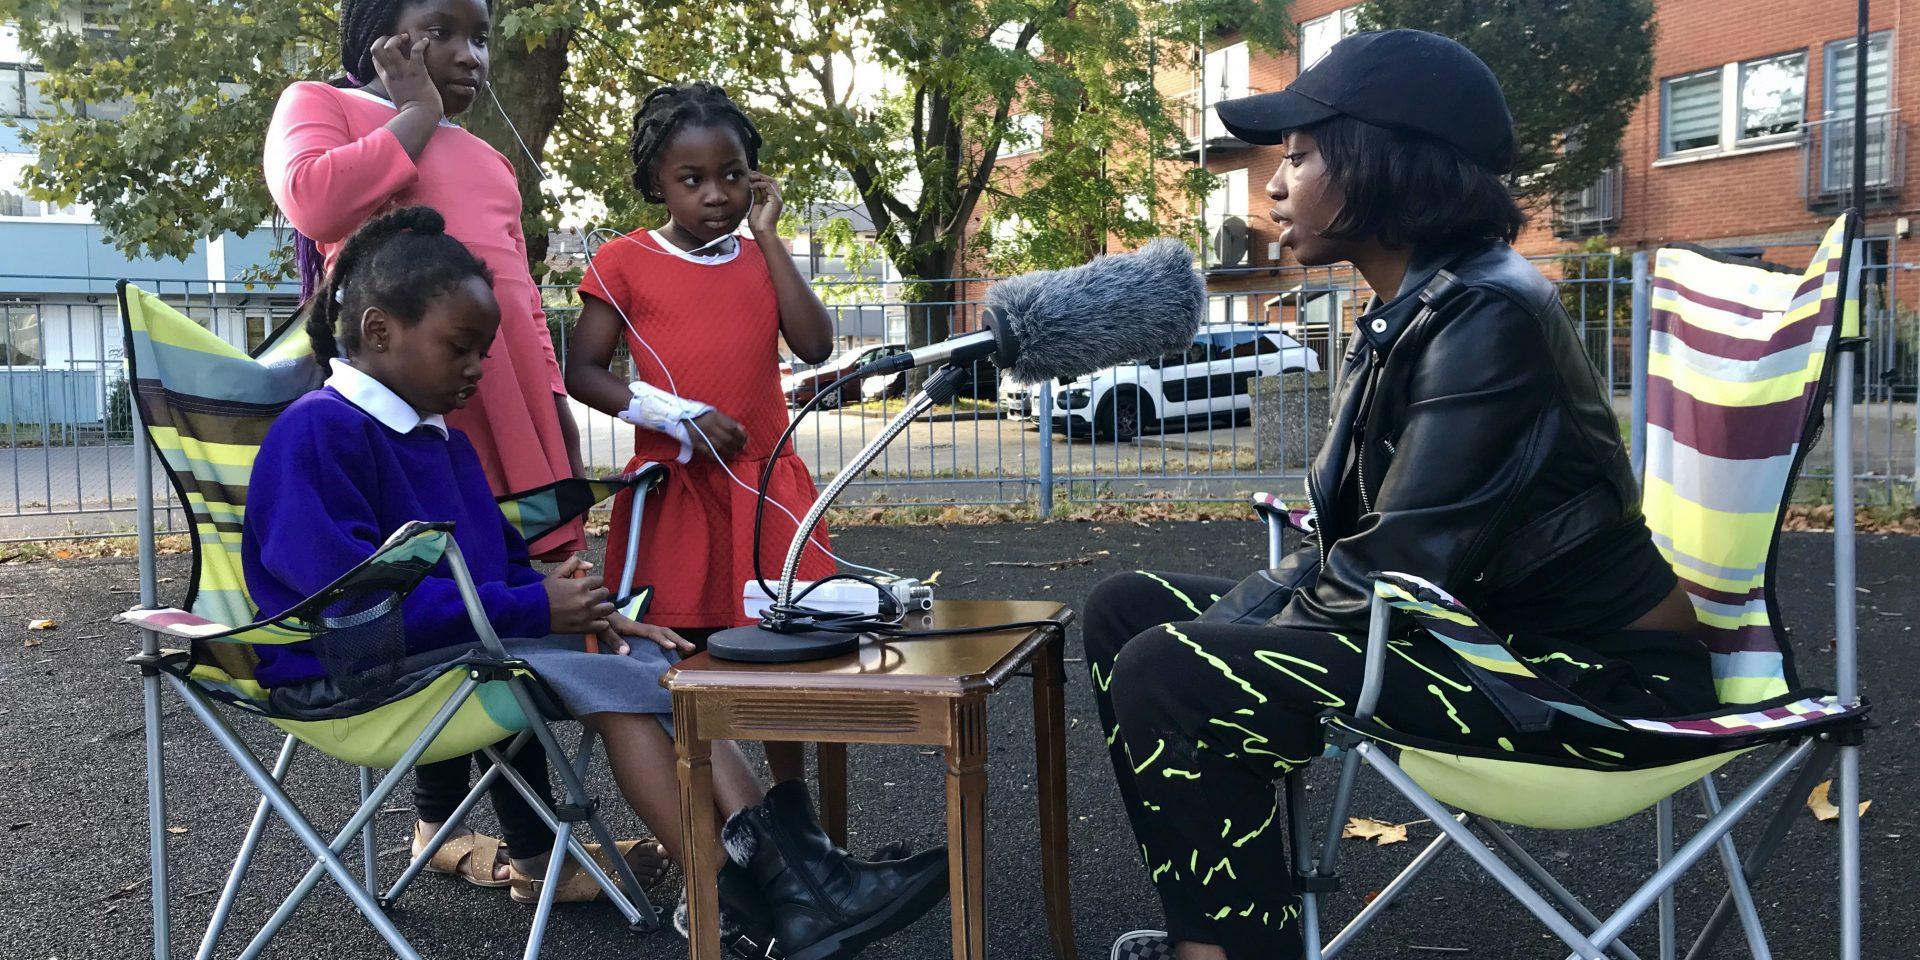 Three children interview an adult sat outside